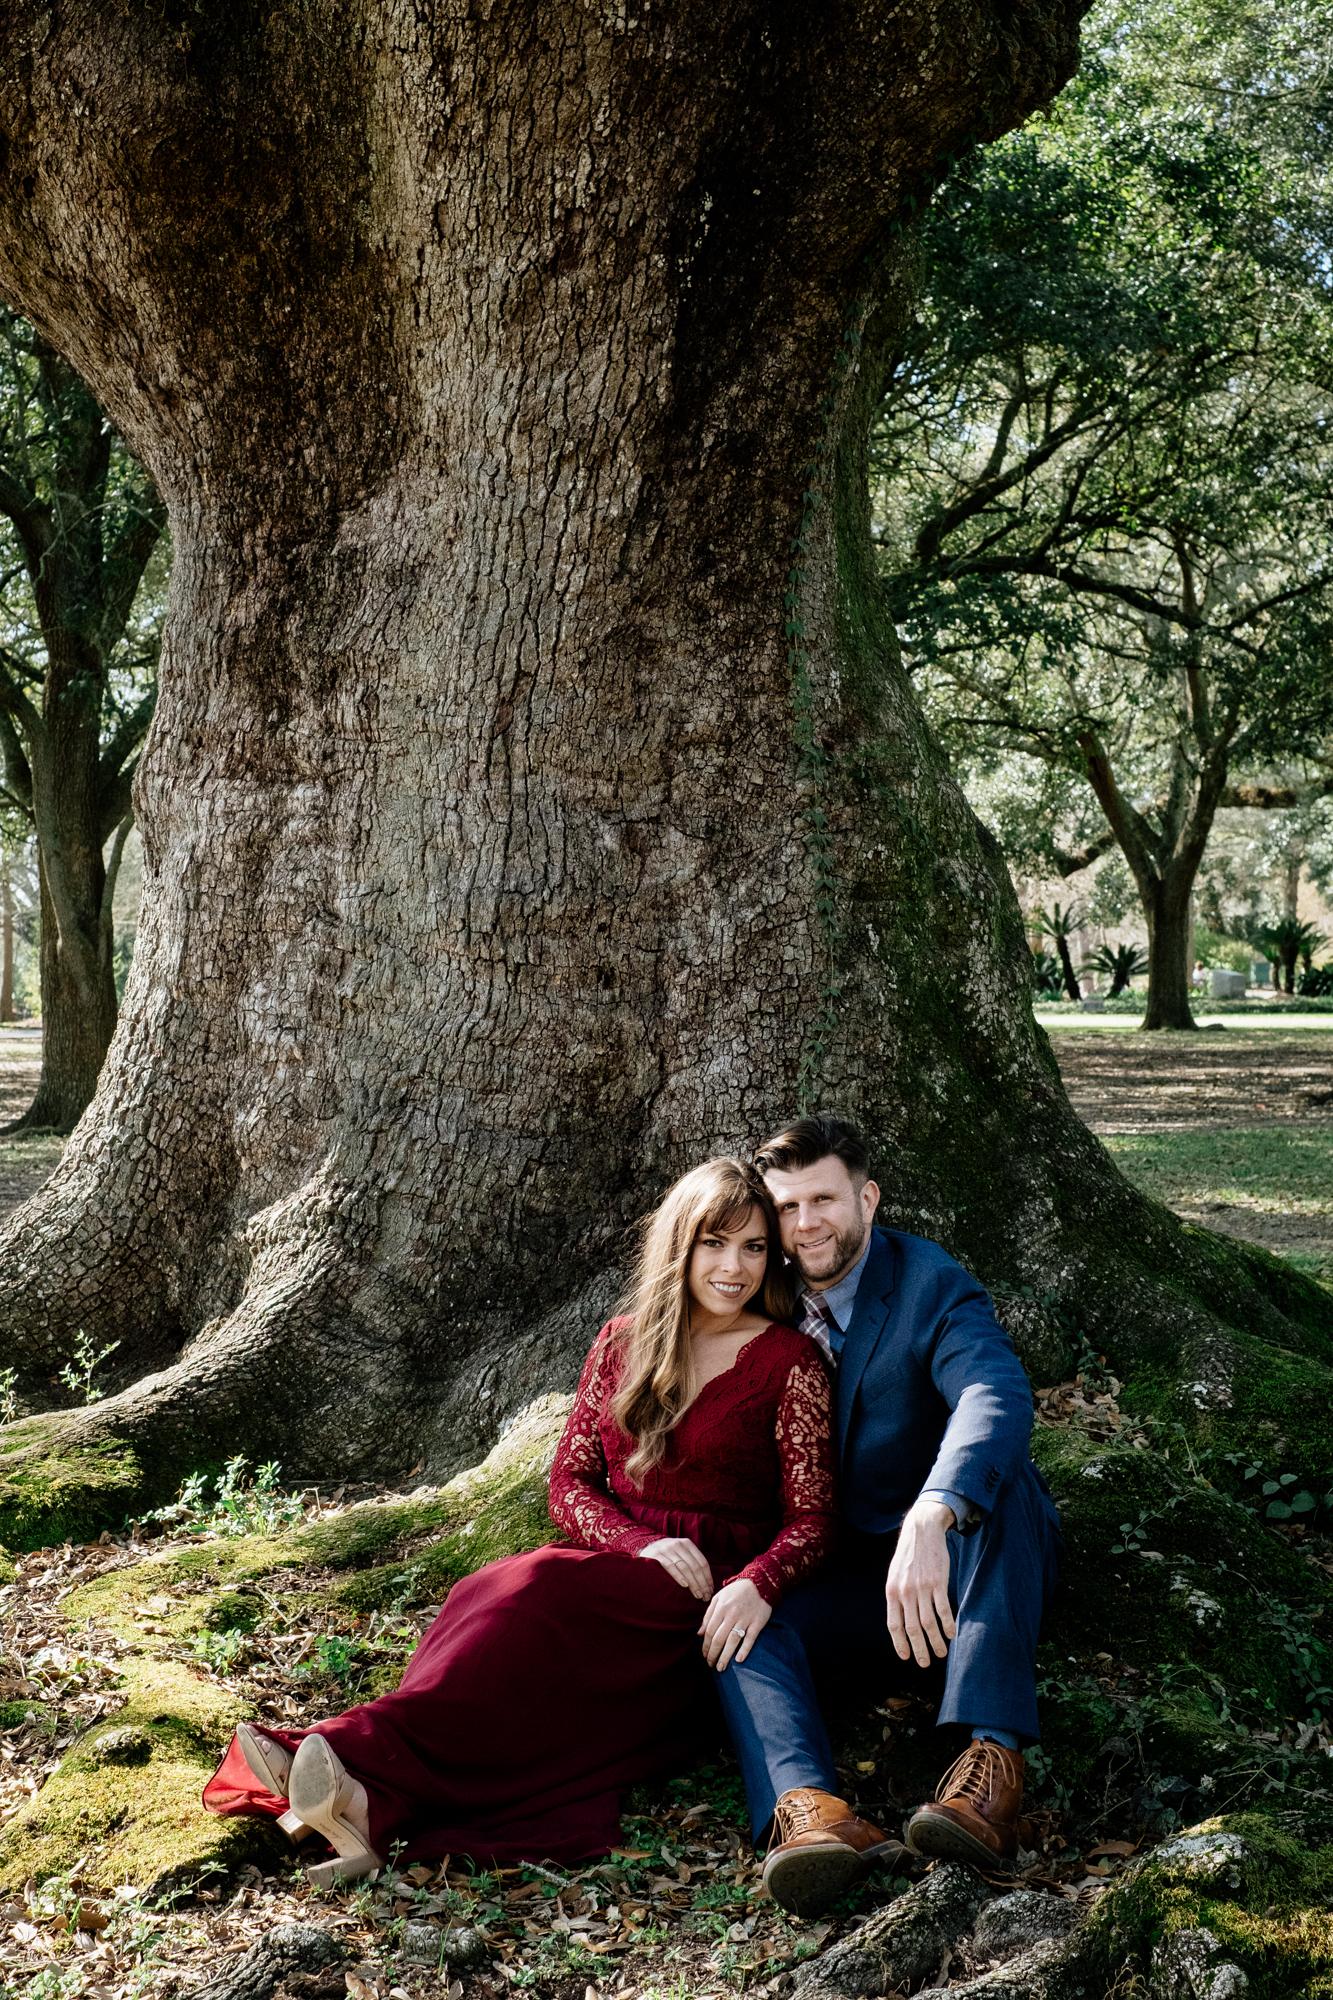 Jen_Montgomery_Photography_Angela_Brian_Engagement_Proposal_FB-139.jpg